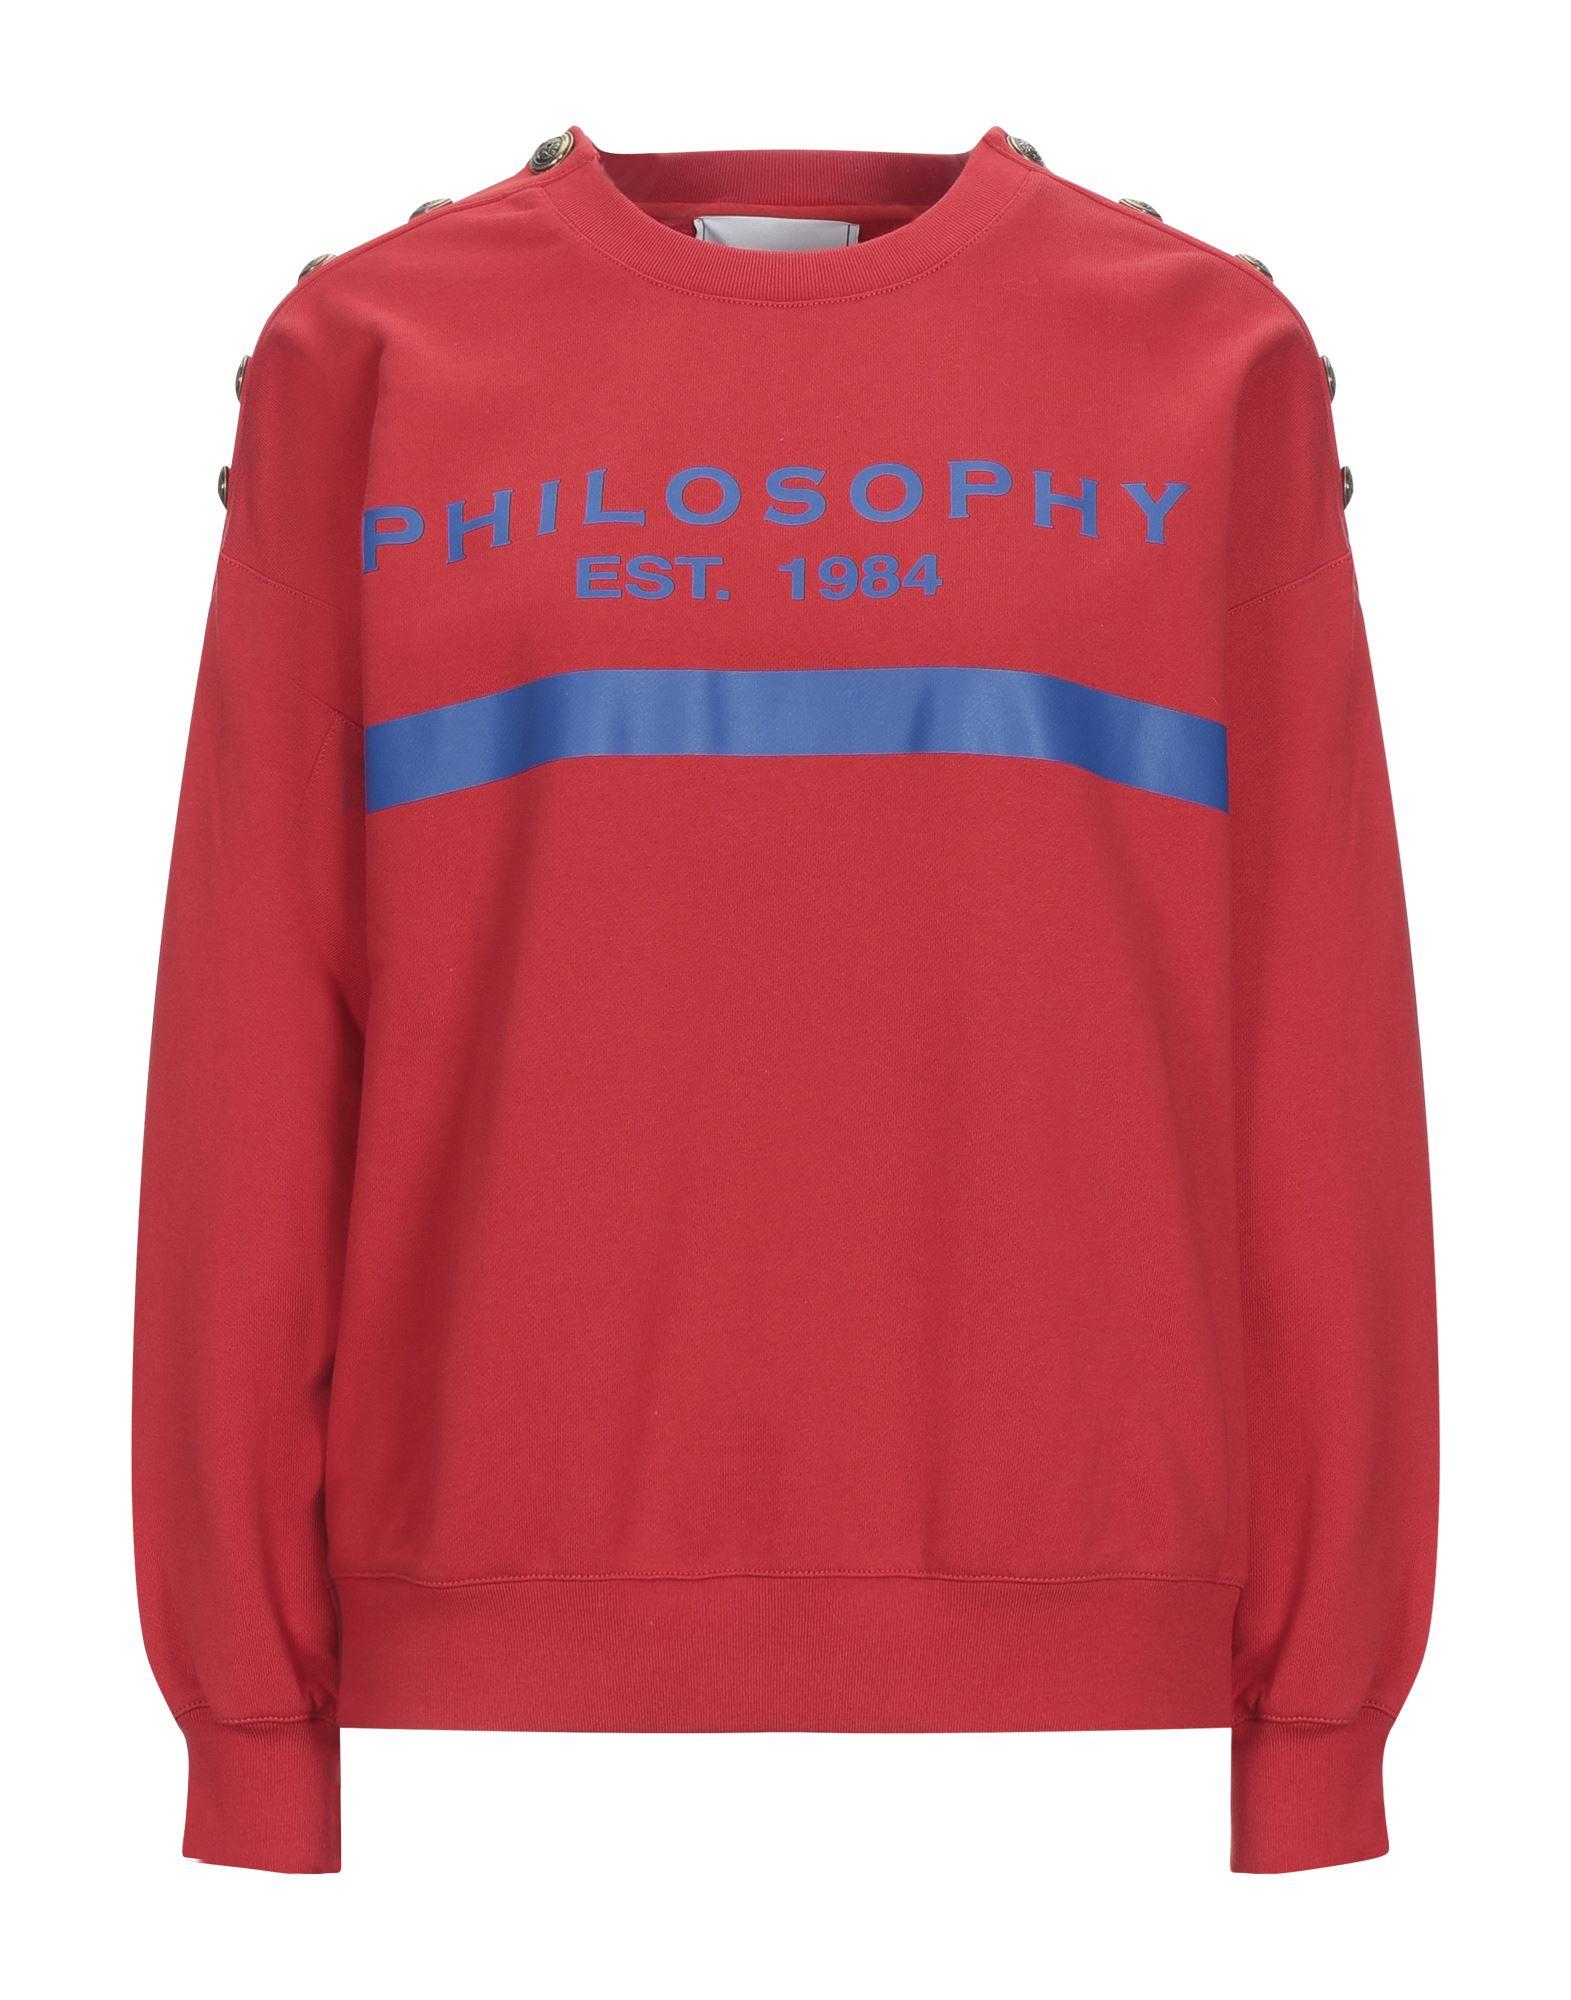 PHILOSOPHY di LORENZO SERAFINI Sweatshirts. sweatshirt fleece, logo, solid color, round collar, long sleeves, no pockets, french terry lining. 100% Cotton